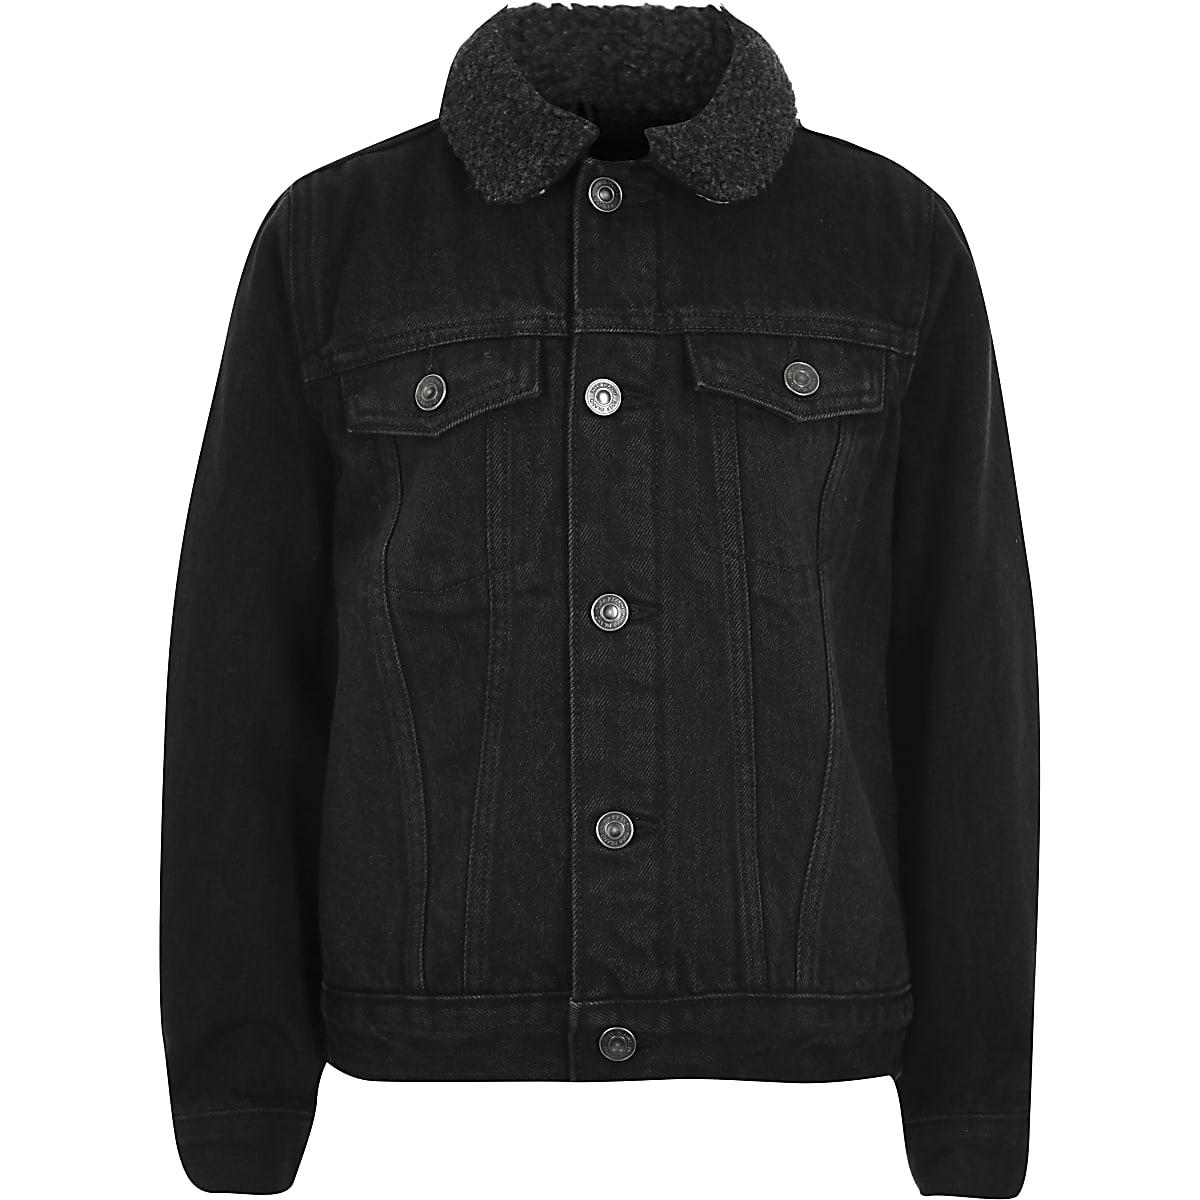 Boys black wash borg lined denim jacket